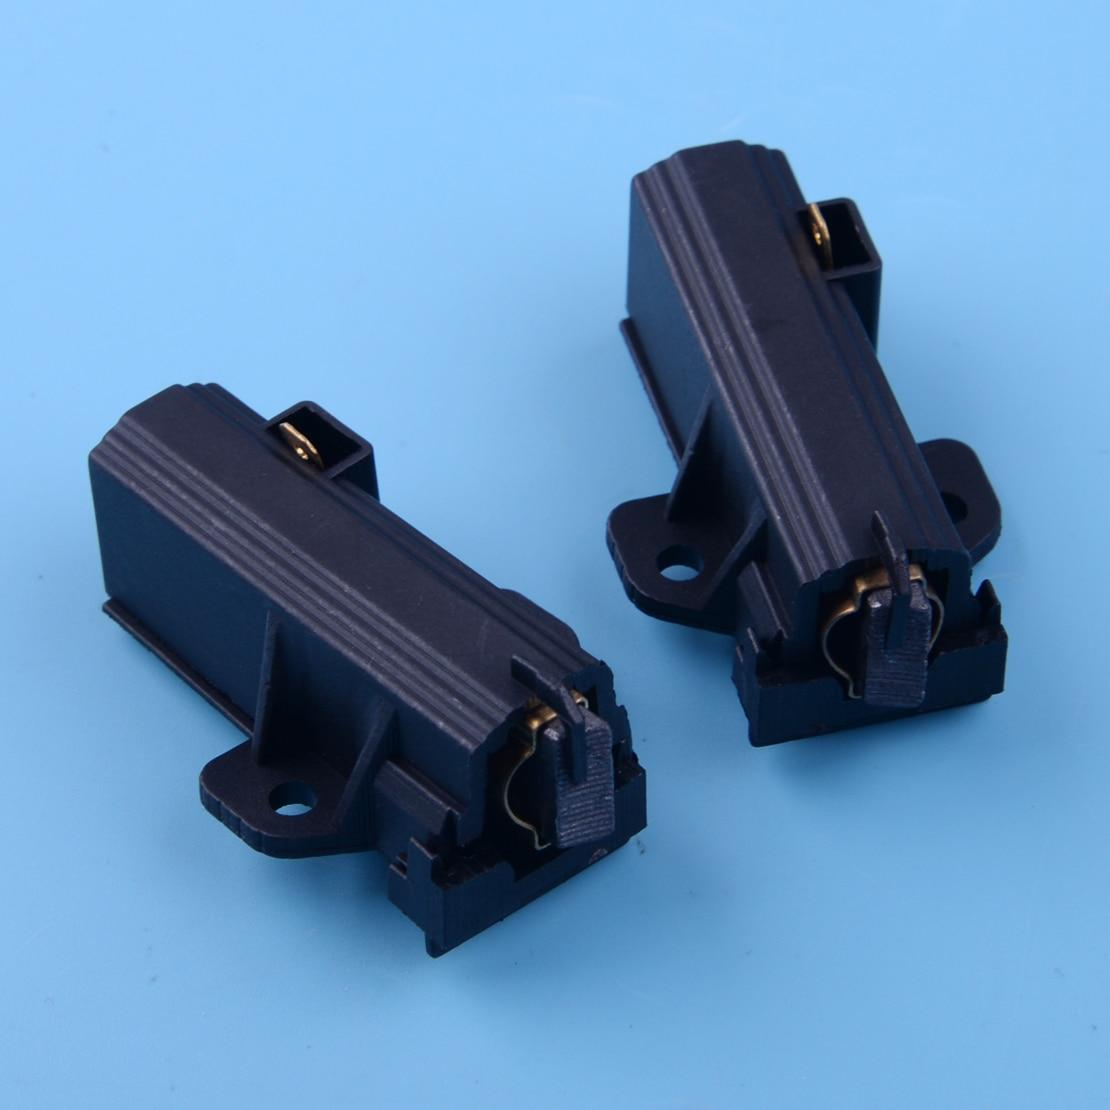 Motor de suela de lavadora LETAOSK, cepillos de carbono laminados aptos para Zanussi Electrolux AEG 4006020152